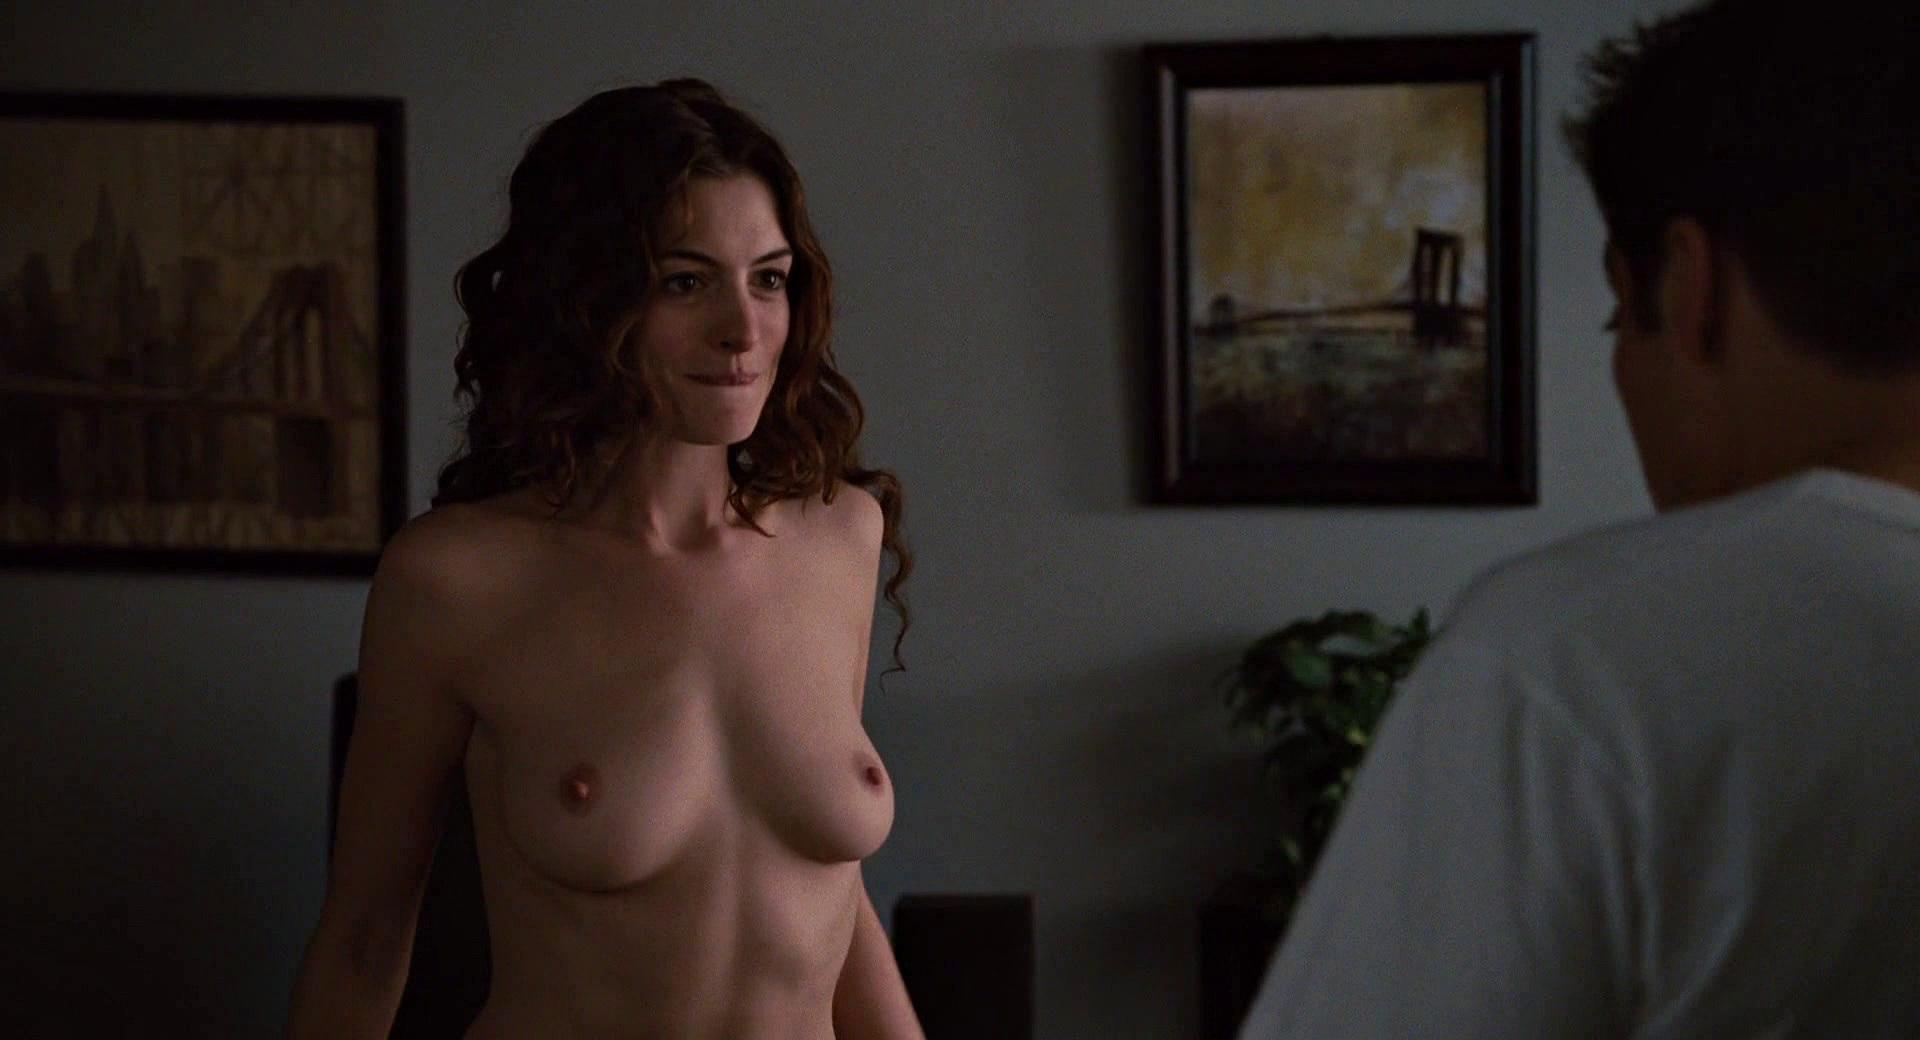 Anne hathaway nude upskirt